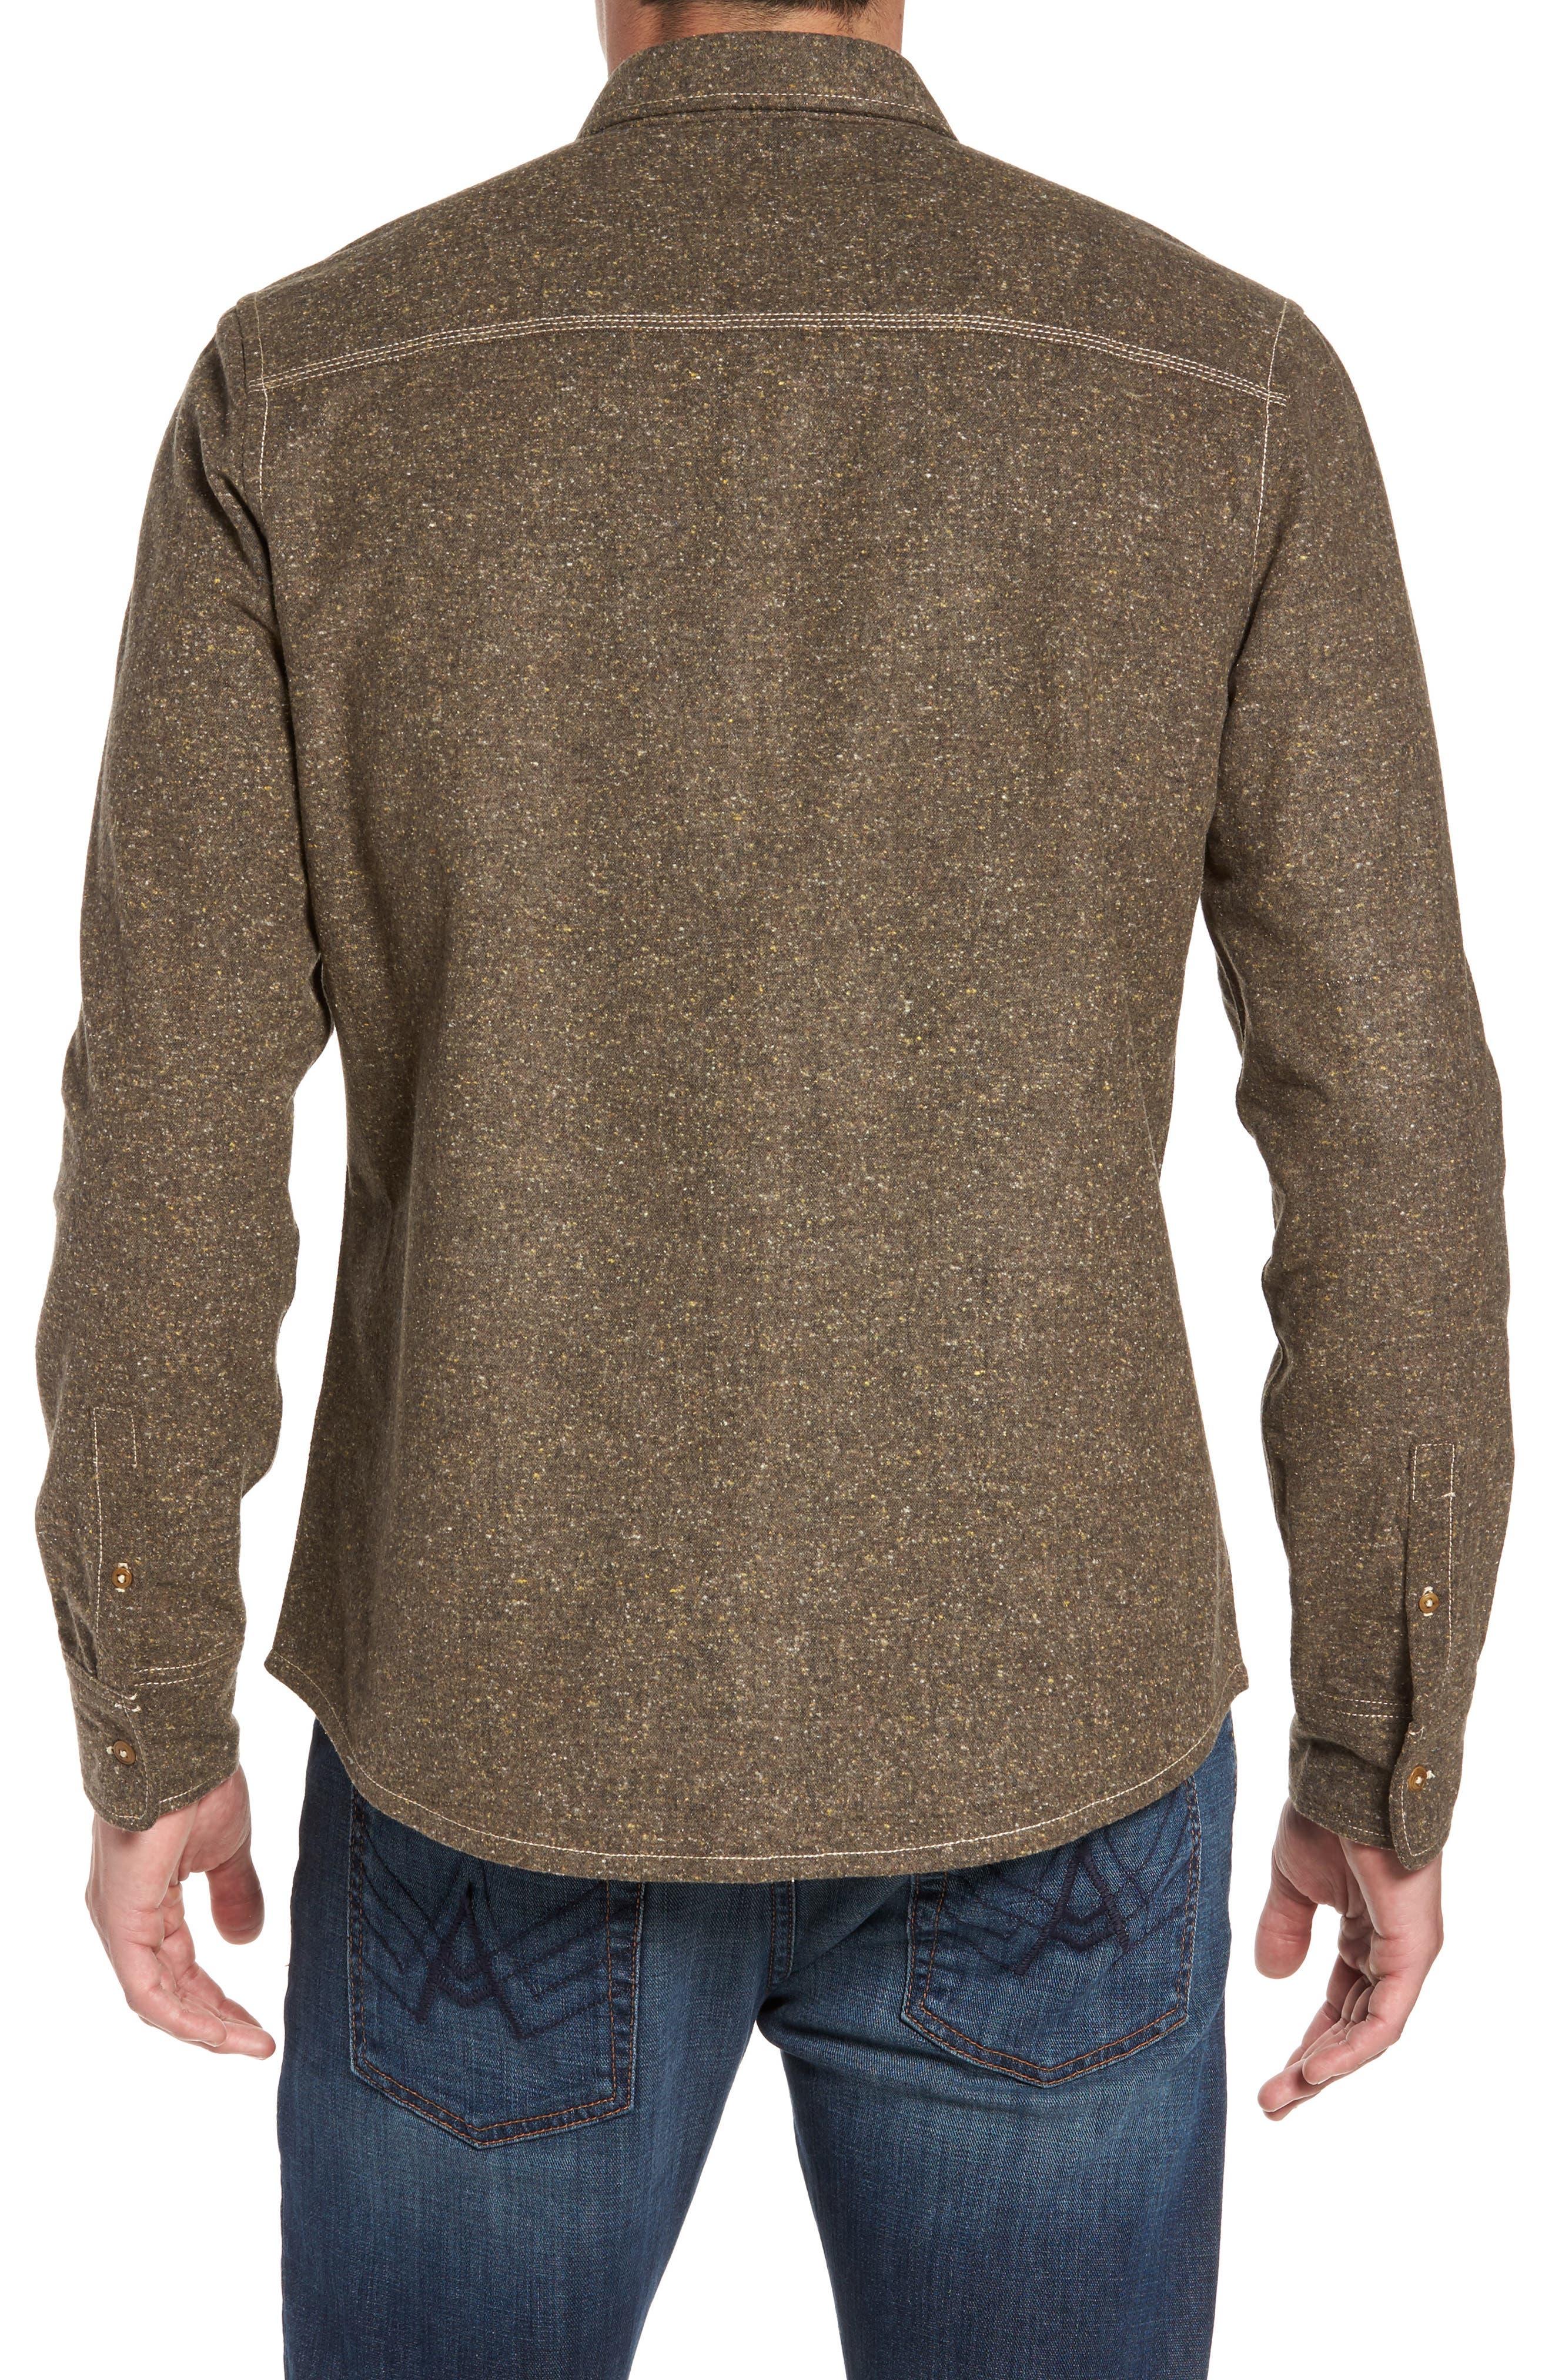 Utah Nep Heather Flannel Shirt,                             Alternate thumbnail 2, color,                             Mole Heather